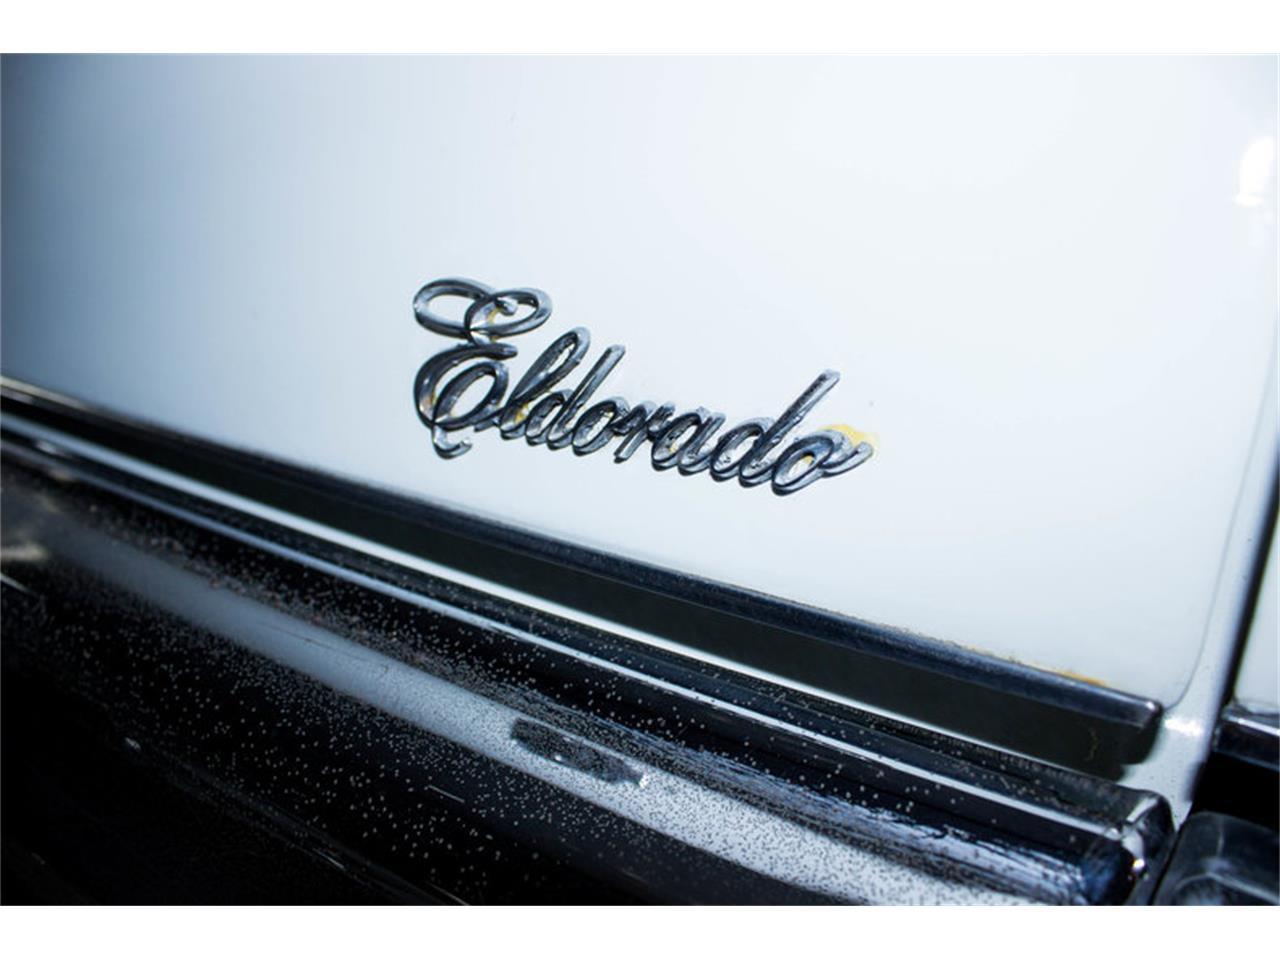 Large Picture of '73 Cadillac Eldorado located in Florida - $18,997.00 - MD5Y